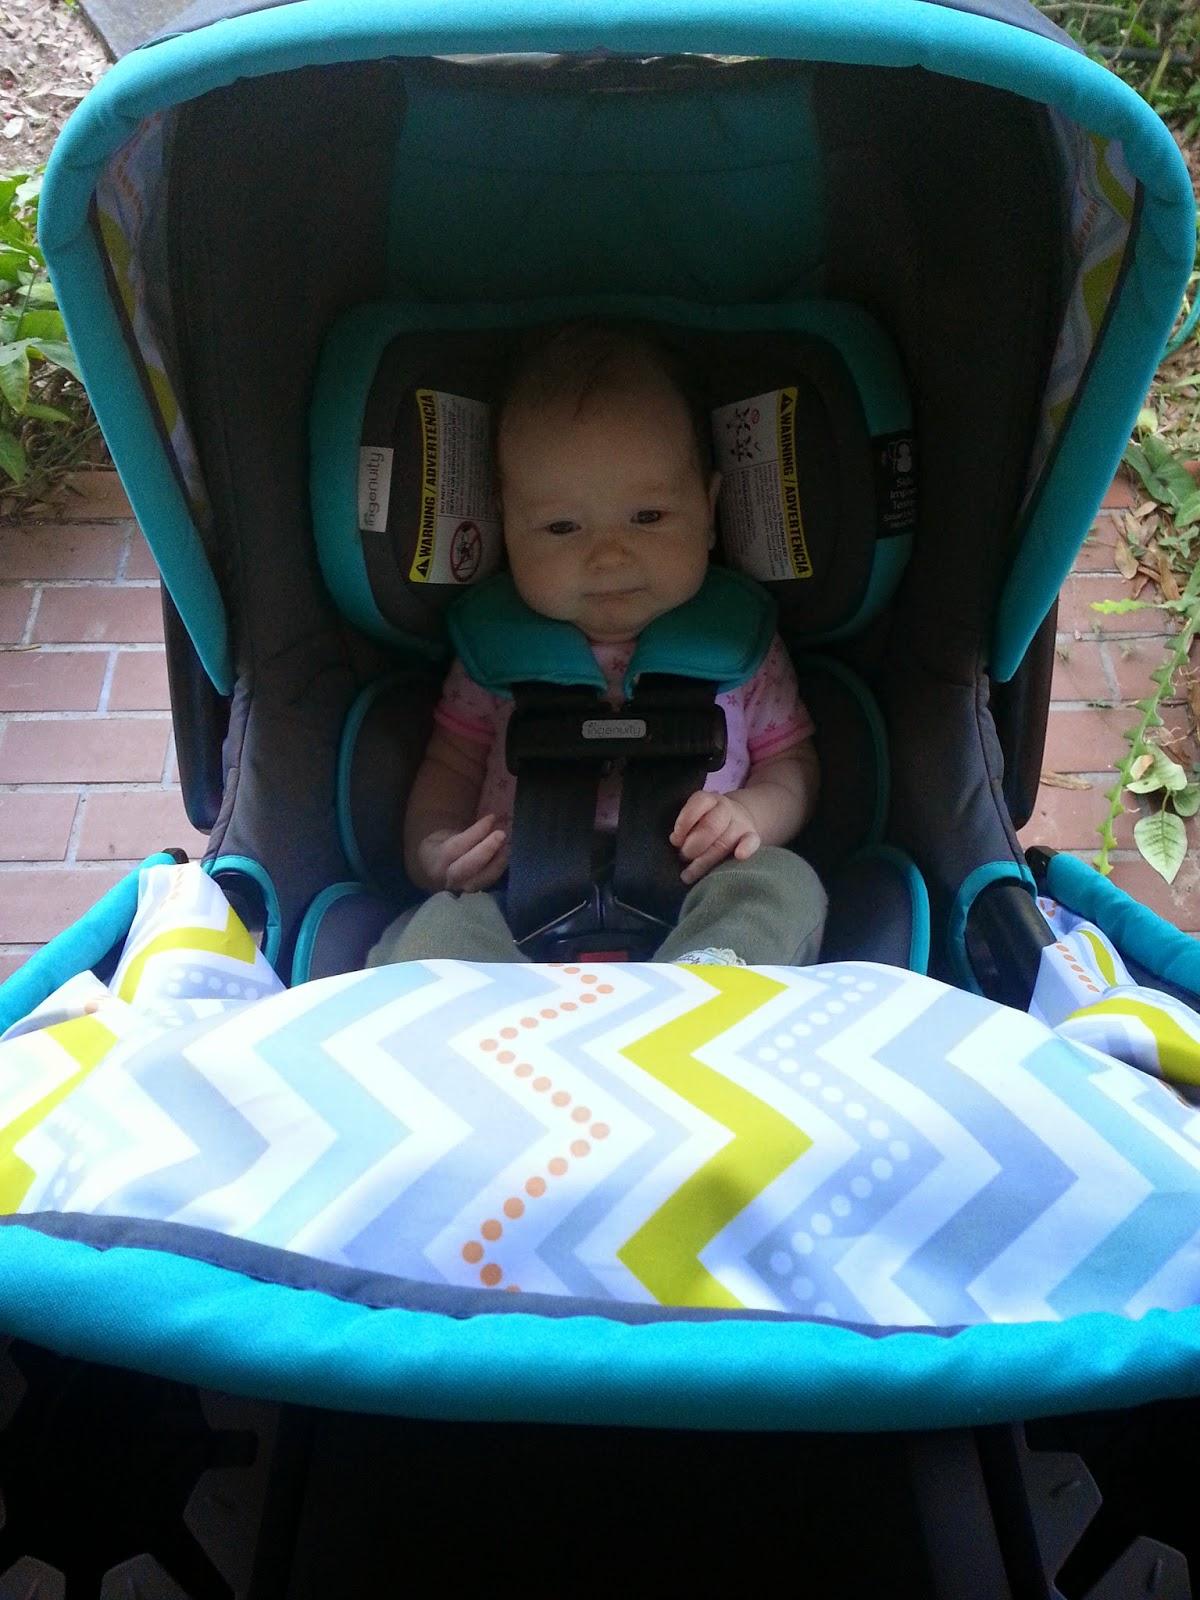 Momma4life Ingenuity Instride Easy Up Travel System Avondale Review